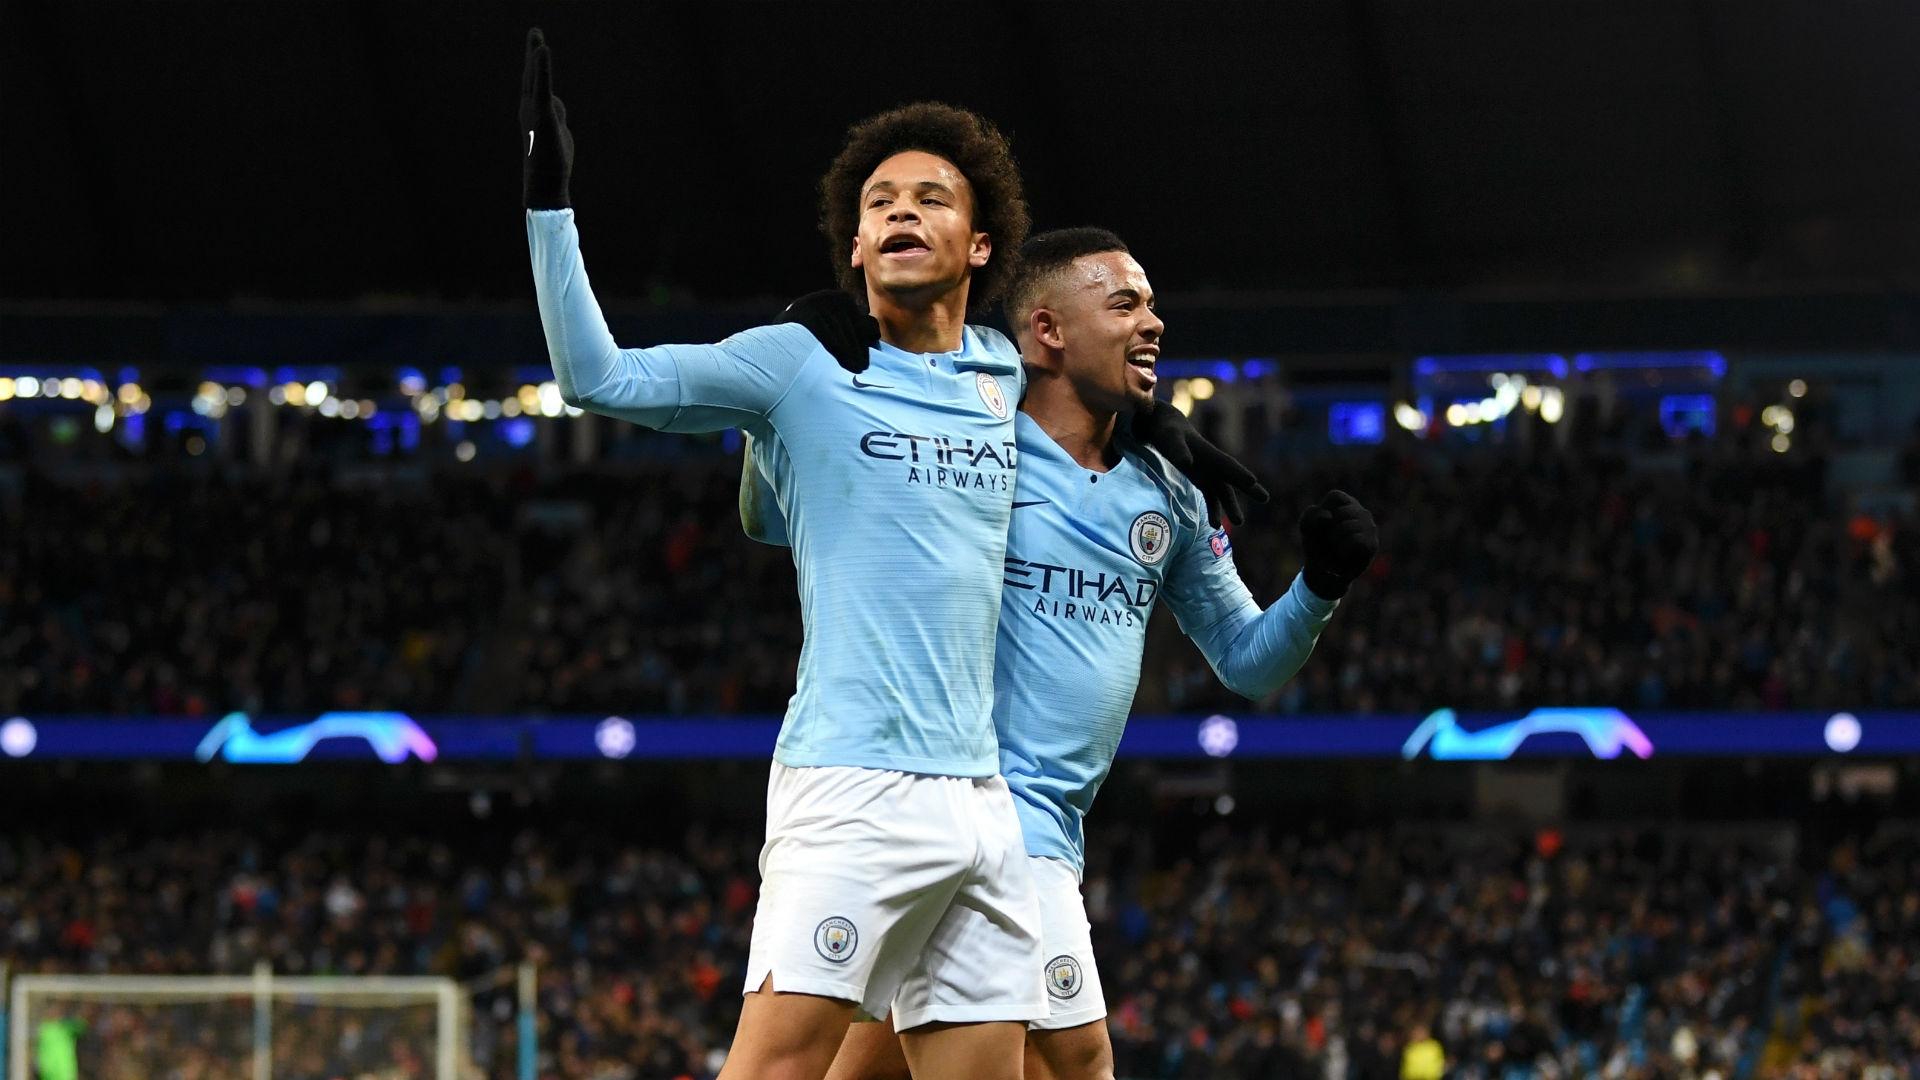 Прогноз на 10.02.2019. Манчестер Сити - Челси